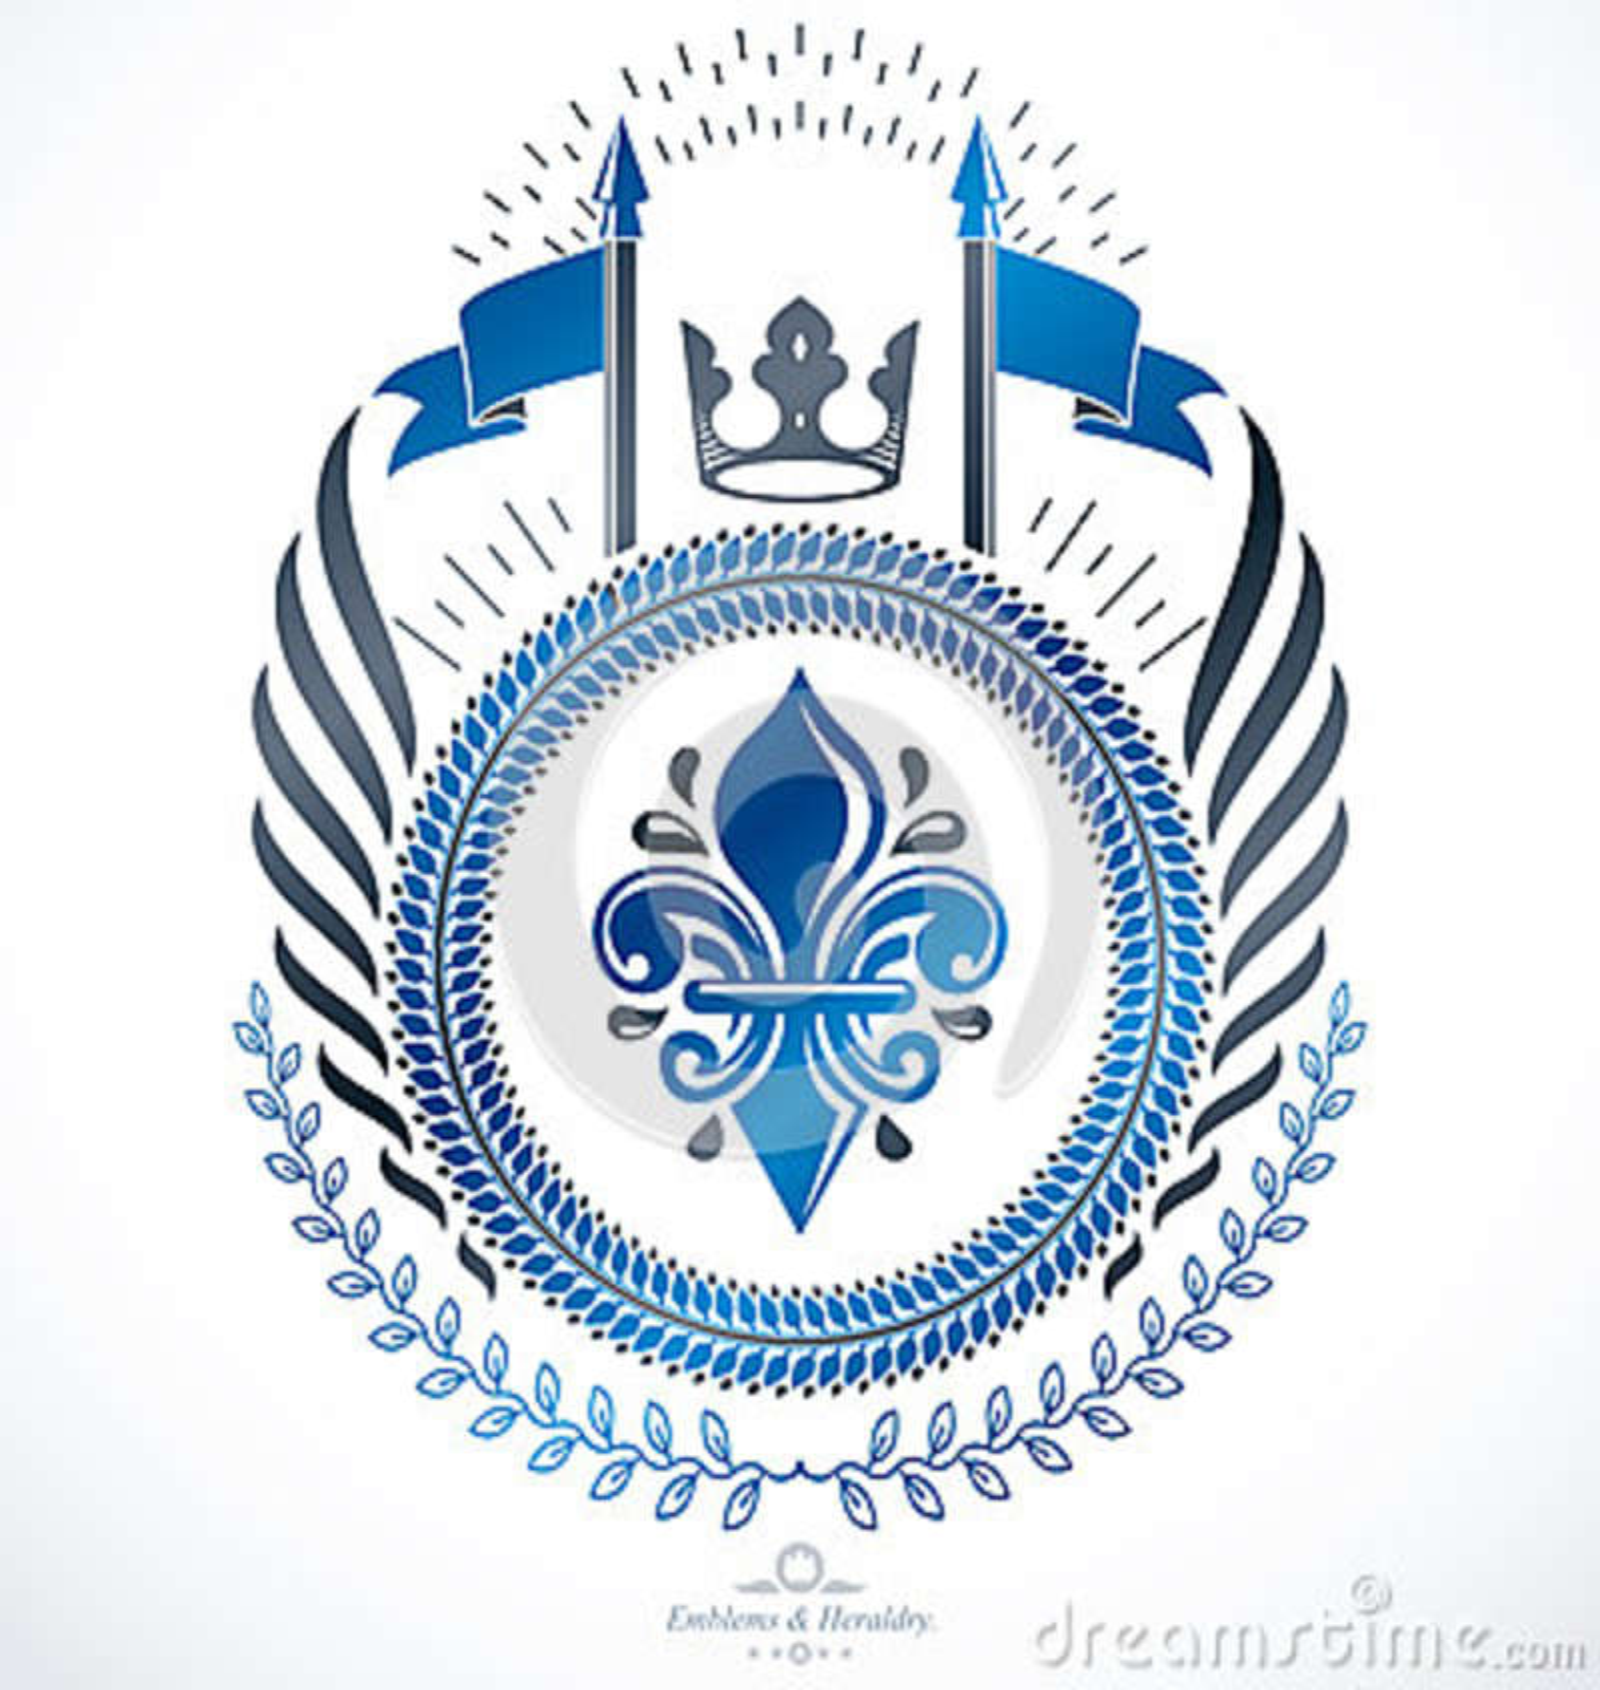 Classy Emblem, Vector Heraldic Coat Of Arms Stock Vector